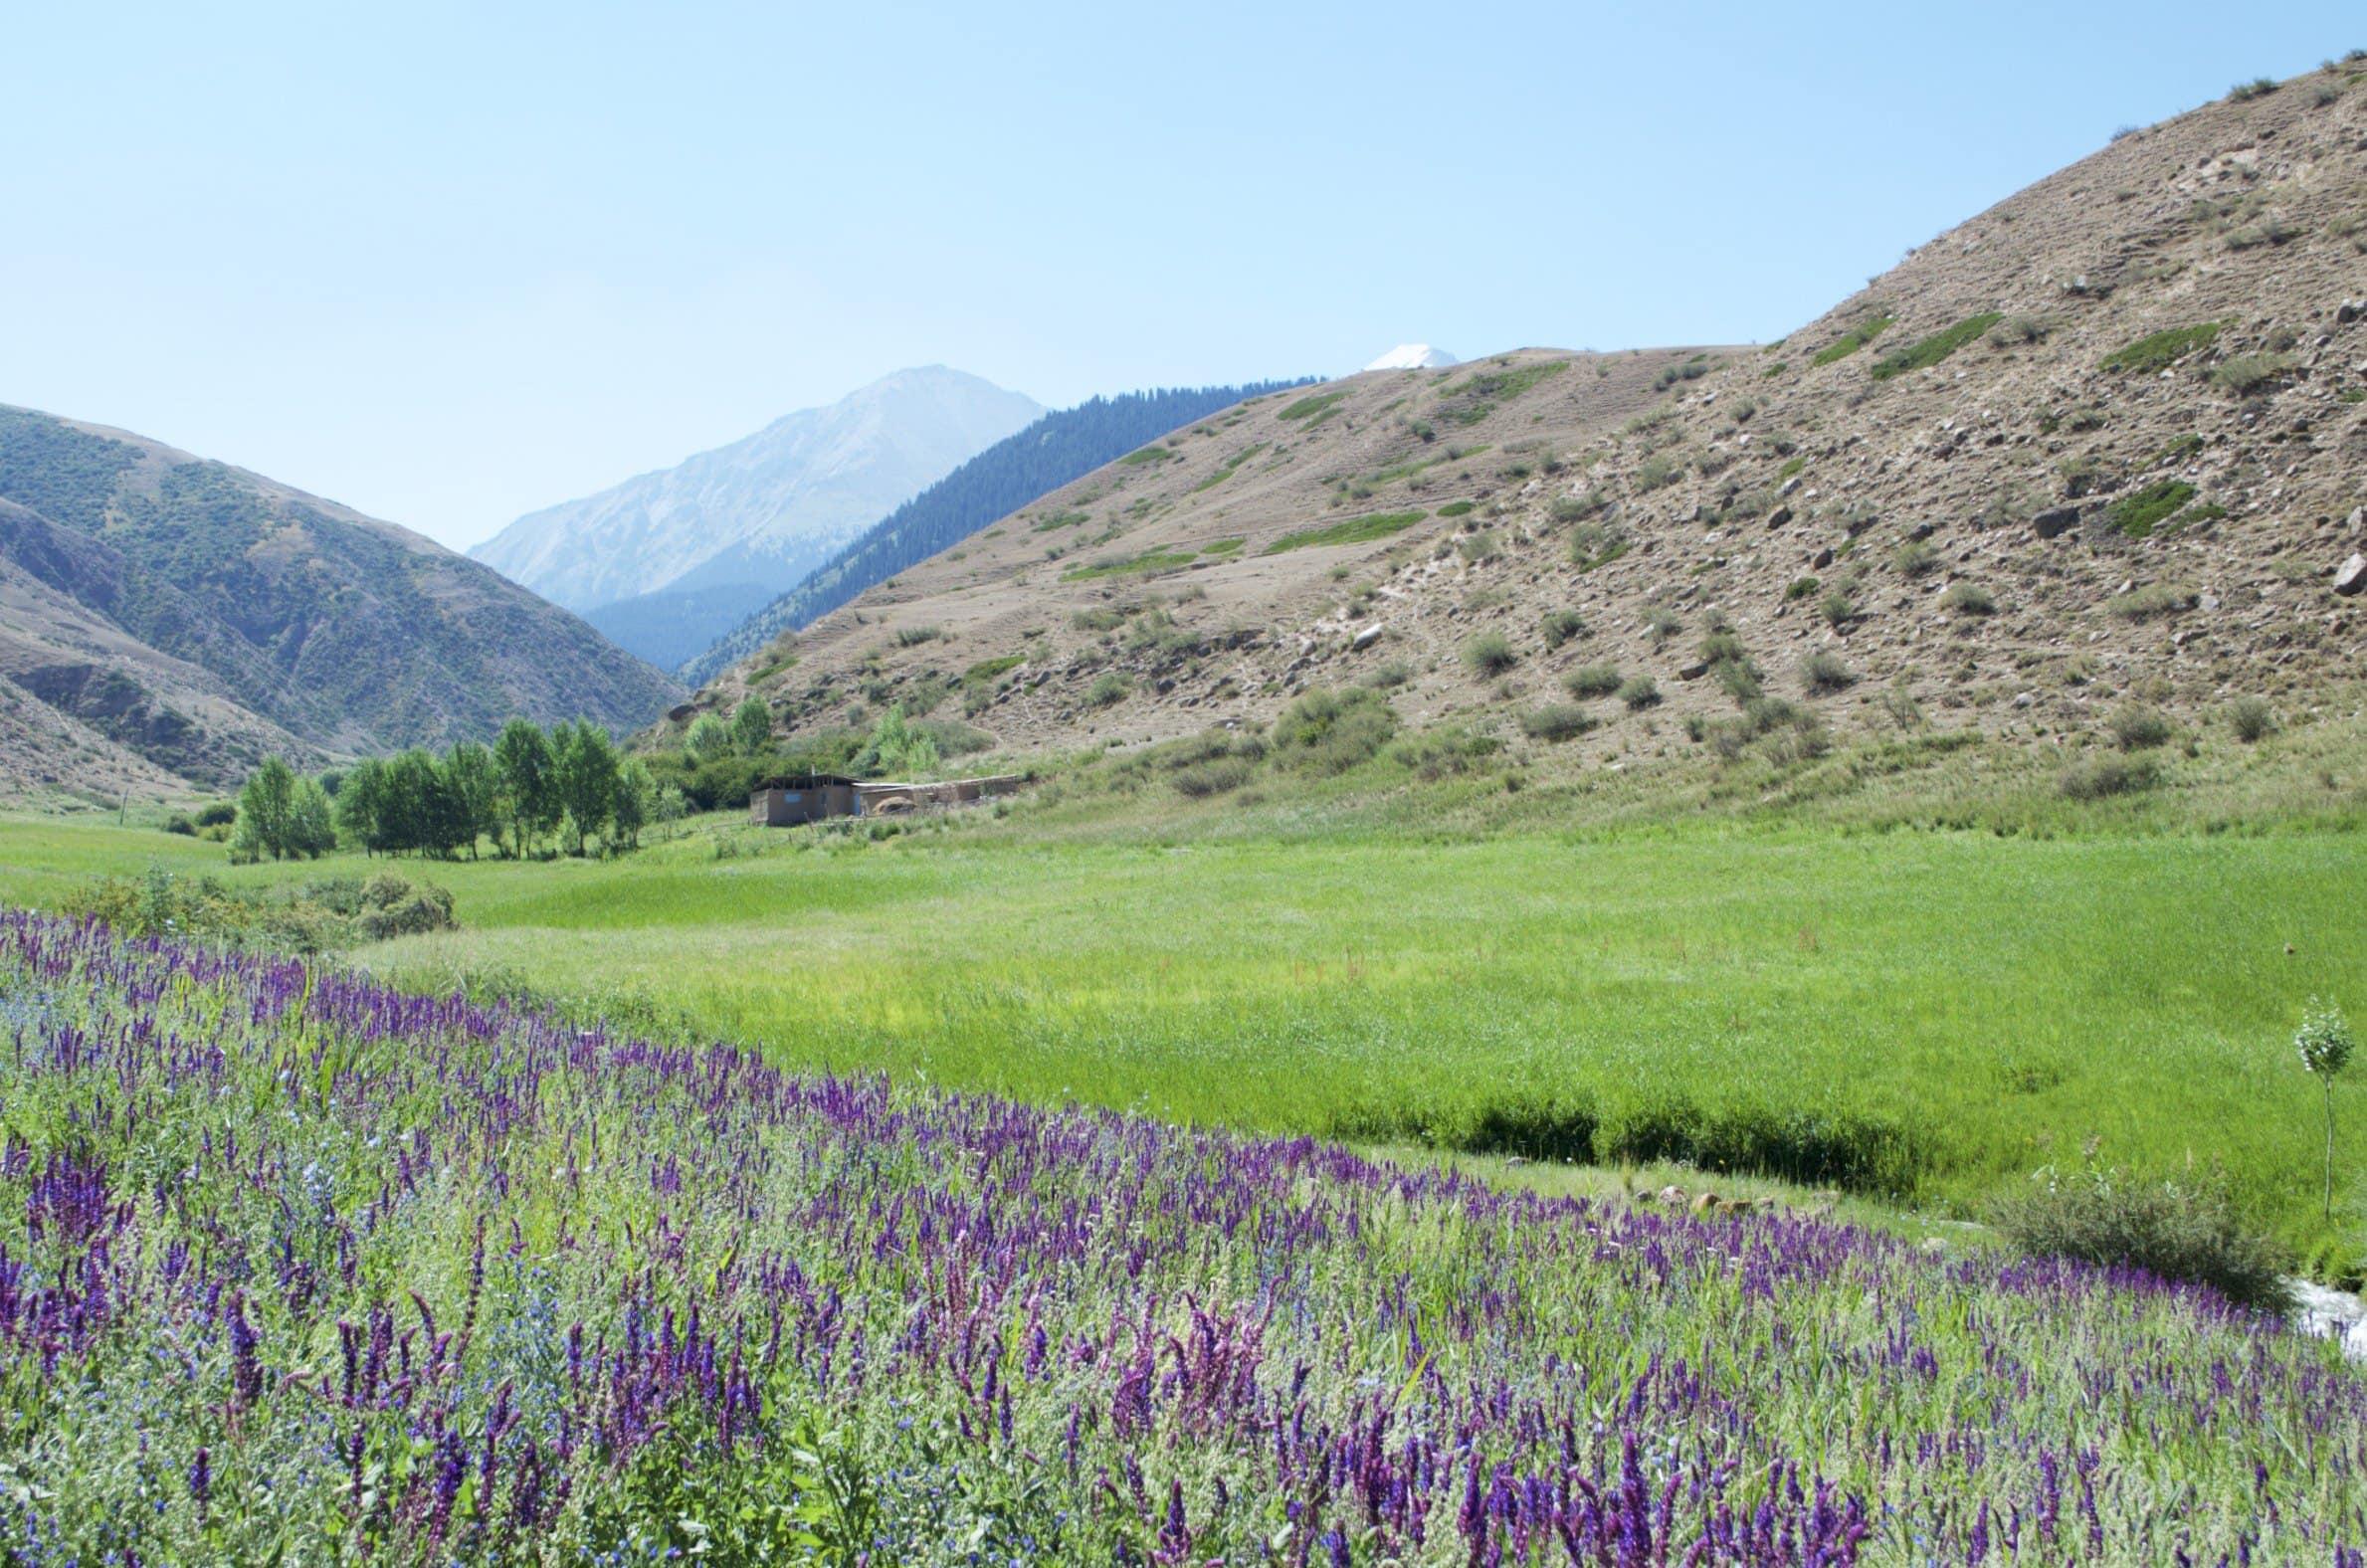 lila Farbenmeer in der Tamga Schlucht Kirgisistan